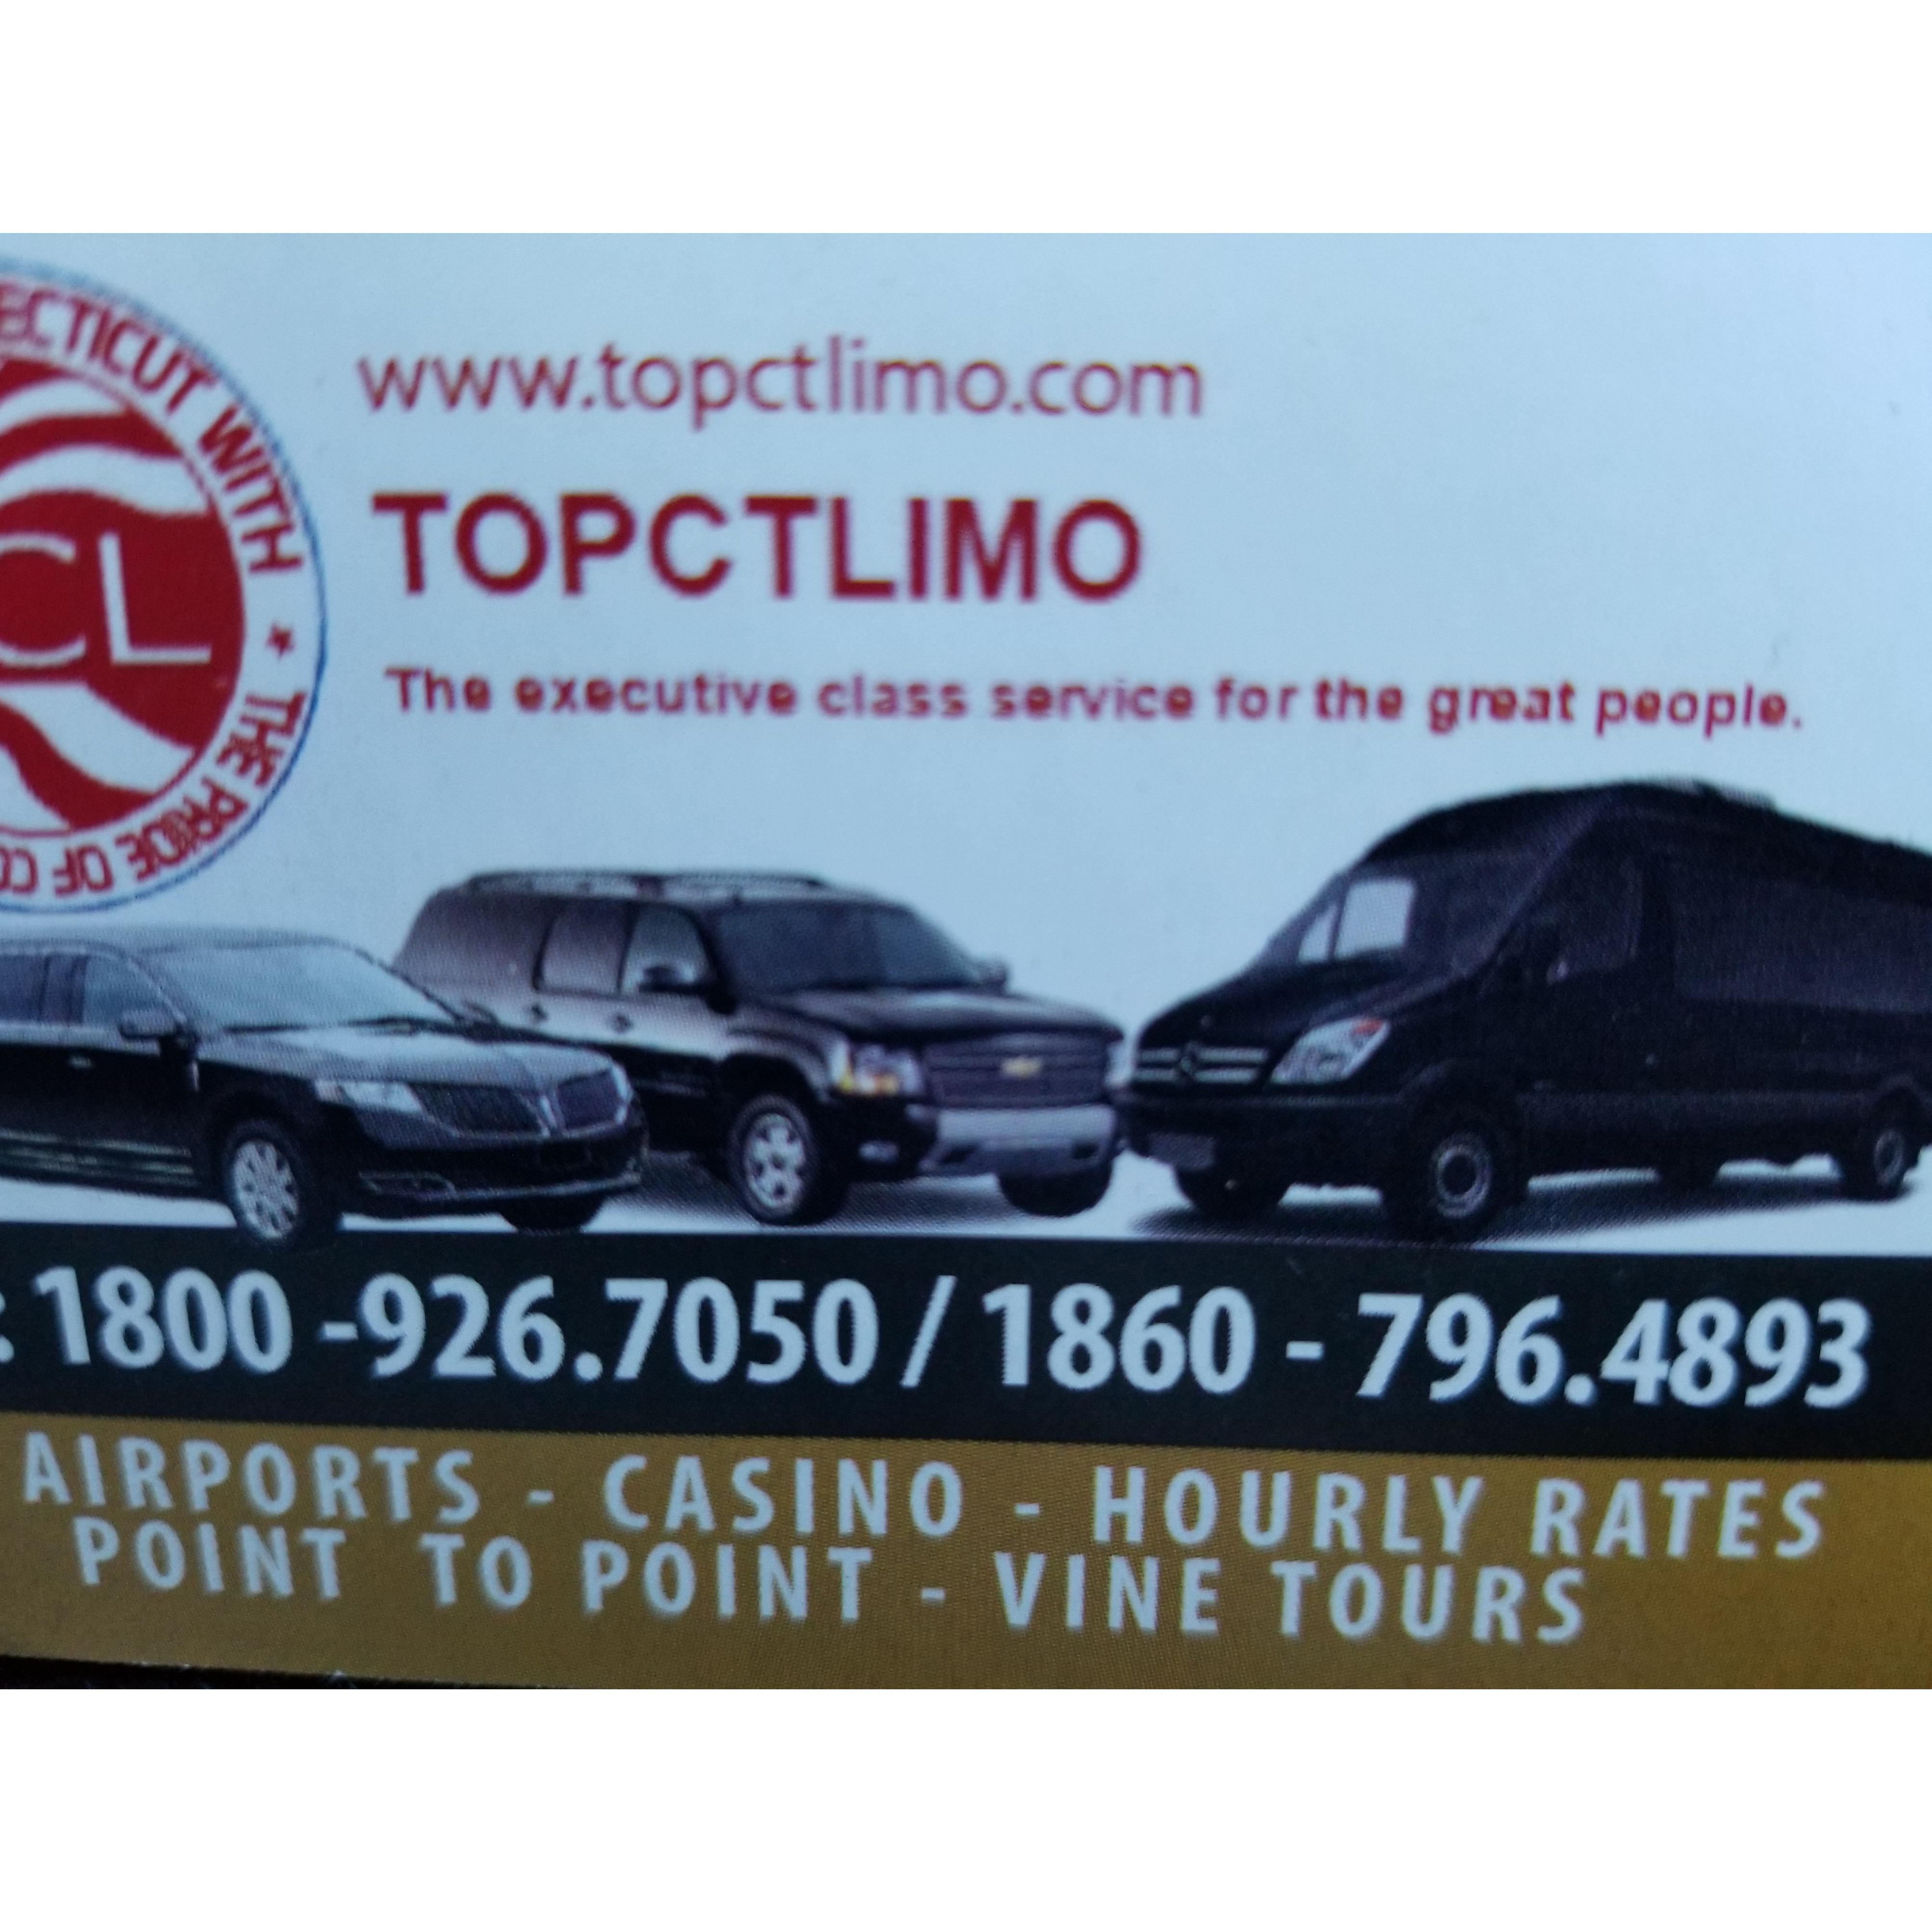 Top CT Limo in Meriden CT 800 796 4